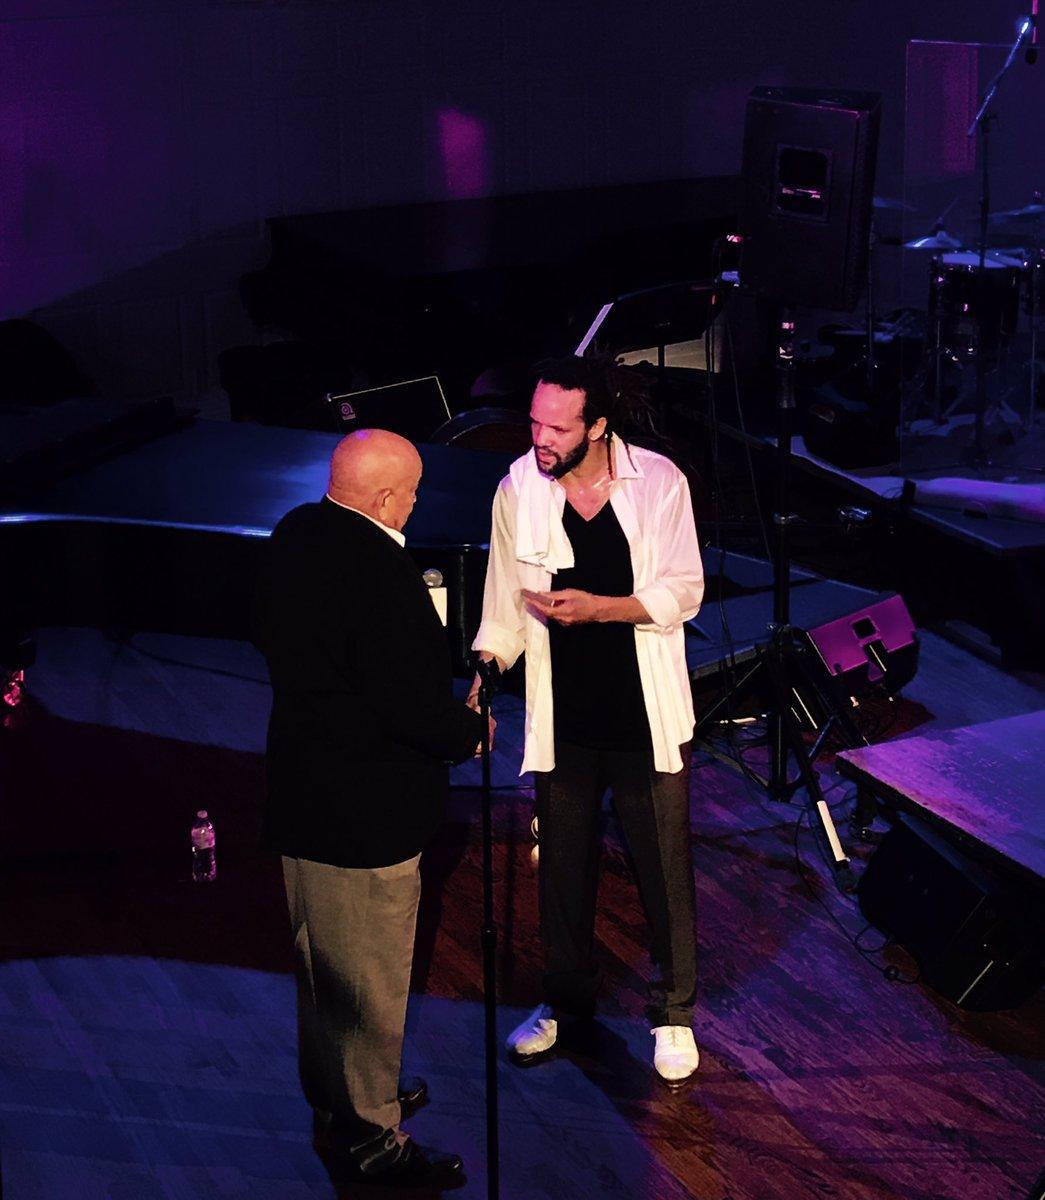 Breaking: Tap-dance legend @TheSavionGlover receives YSM's prestigious Ellington Medal. https://t.co/lotKrWbi1o